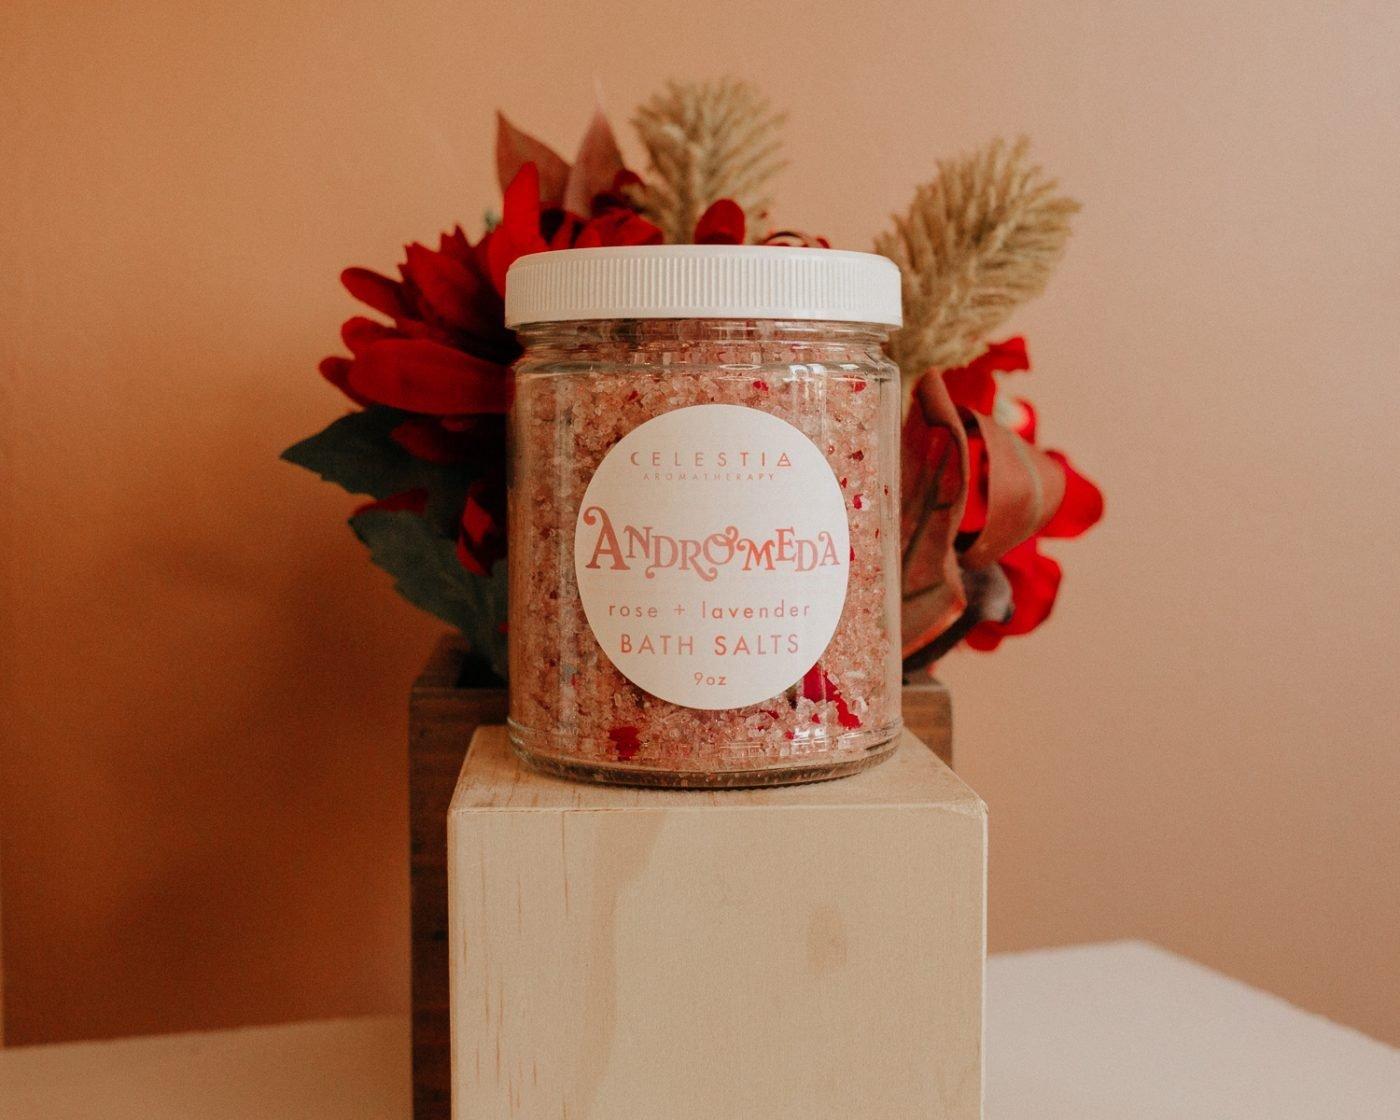 andromeda bath salt by celestia aromatherapy